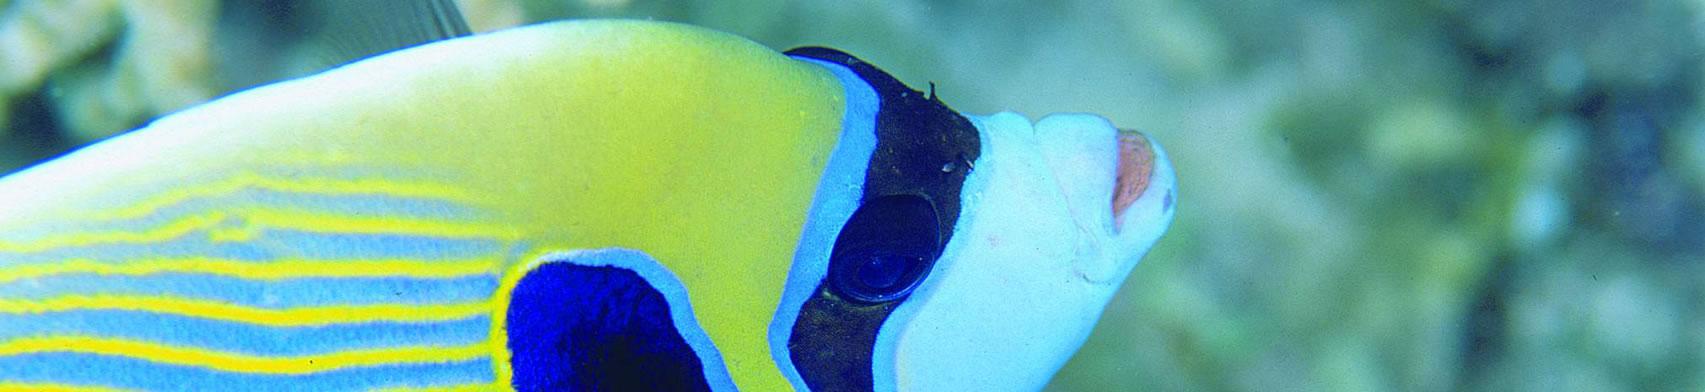 02. snorkeling